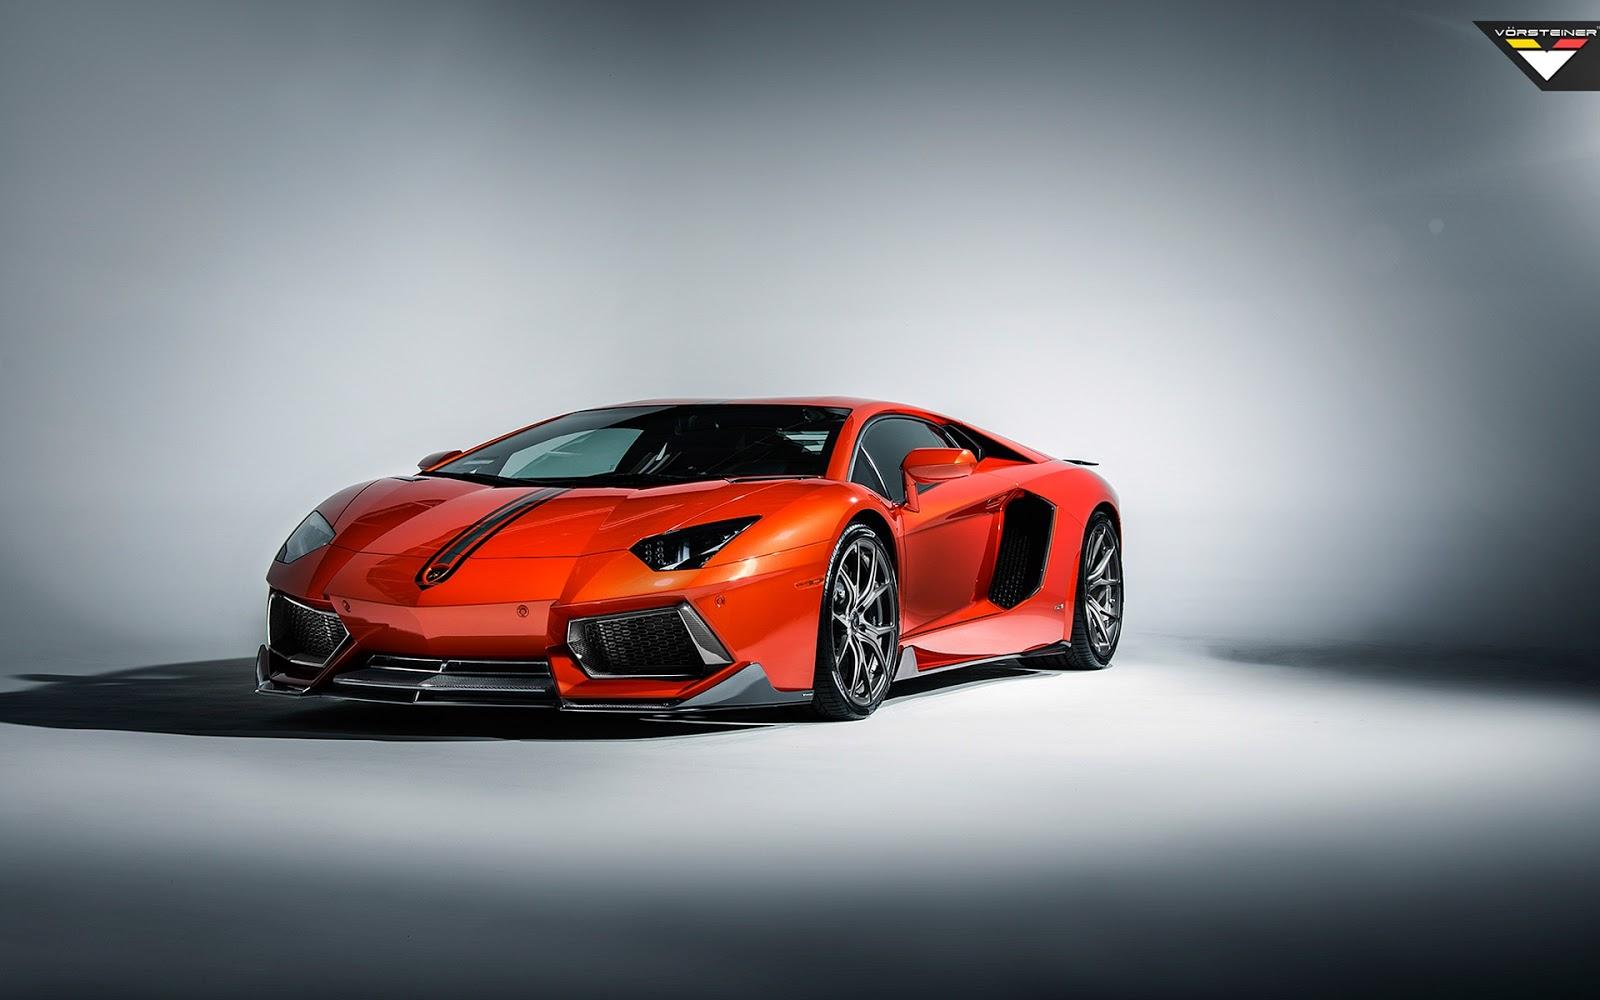 2016 Lamborghini Aventador Wallpaper HD New